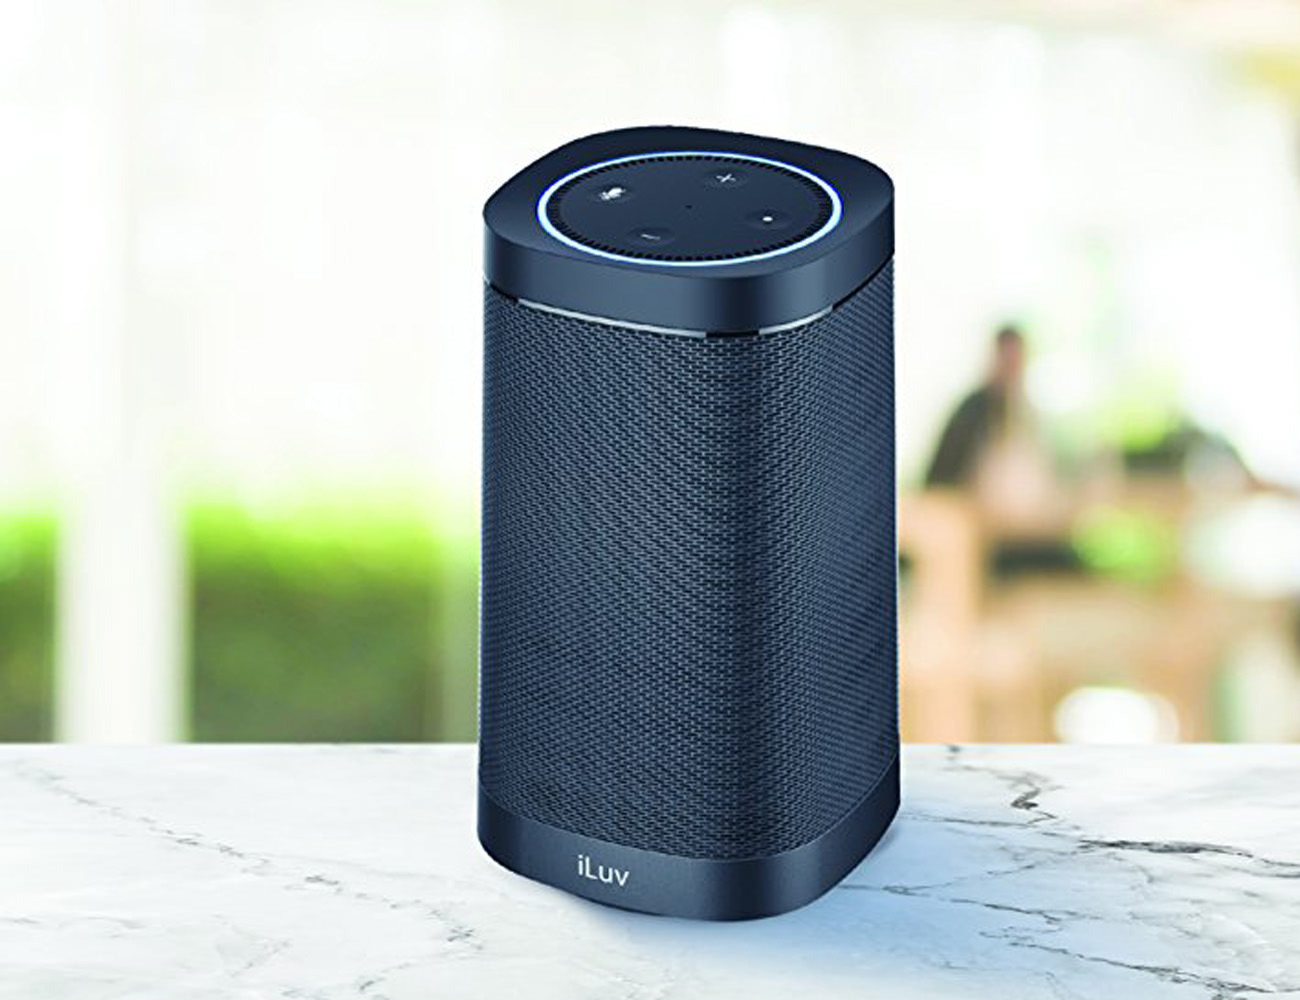 iLuv Aud Amazon Echo Dot Speaker Dock